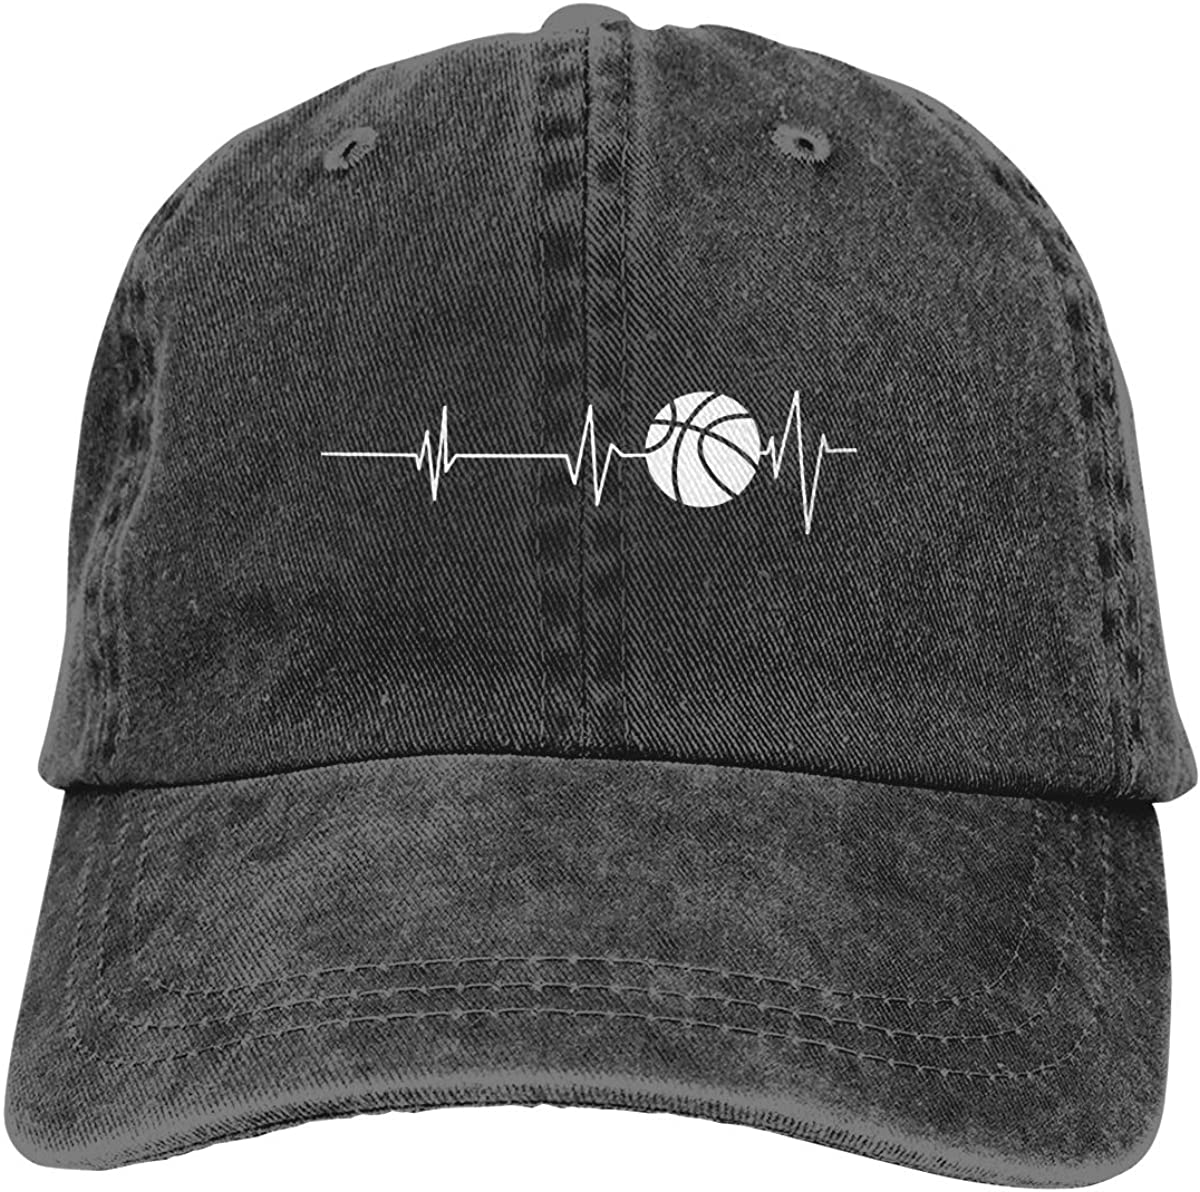 Baseball Cap,Greyhound,Adjustable Dad Denim Hats for Men and Women